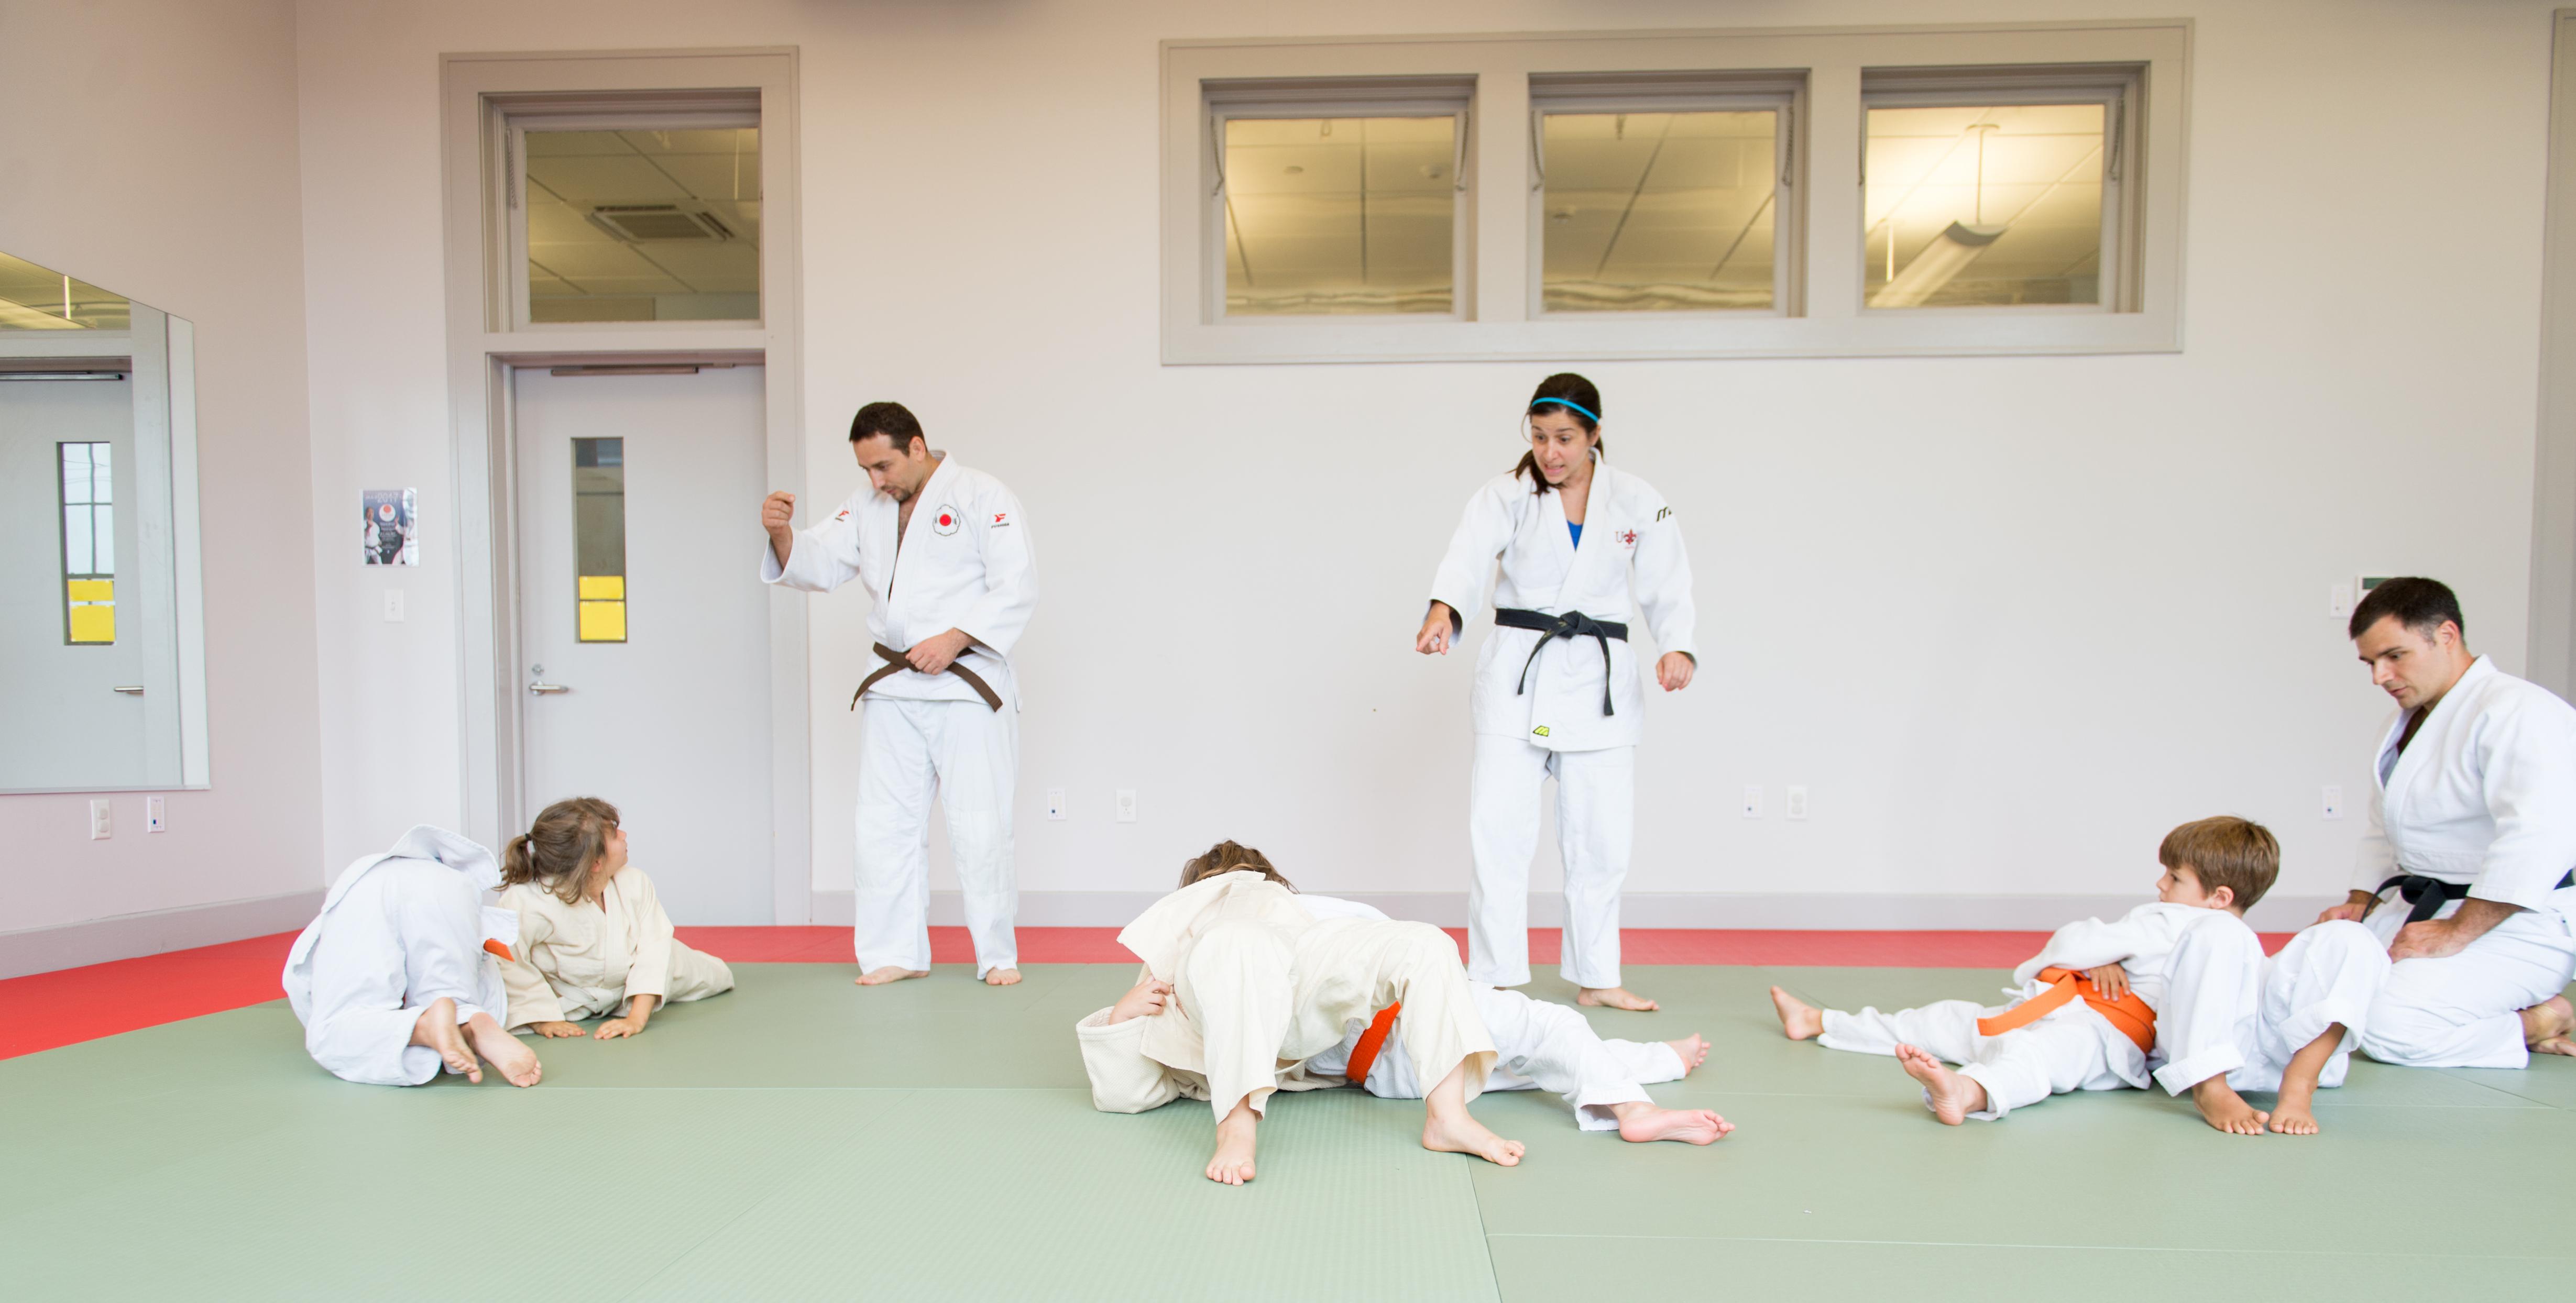 3 Judo Teachers